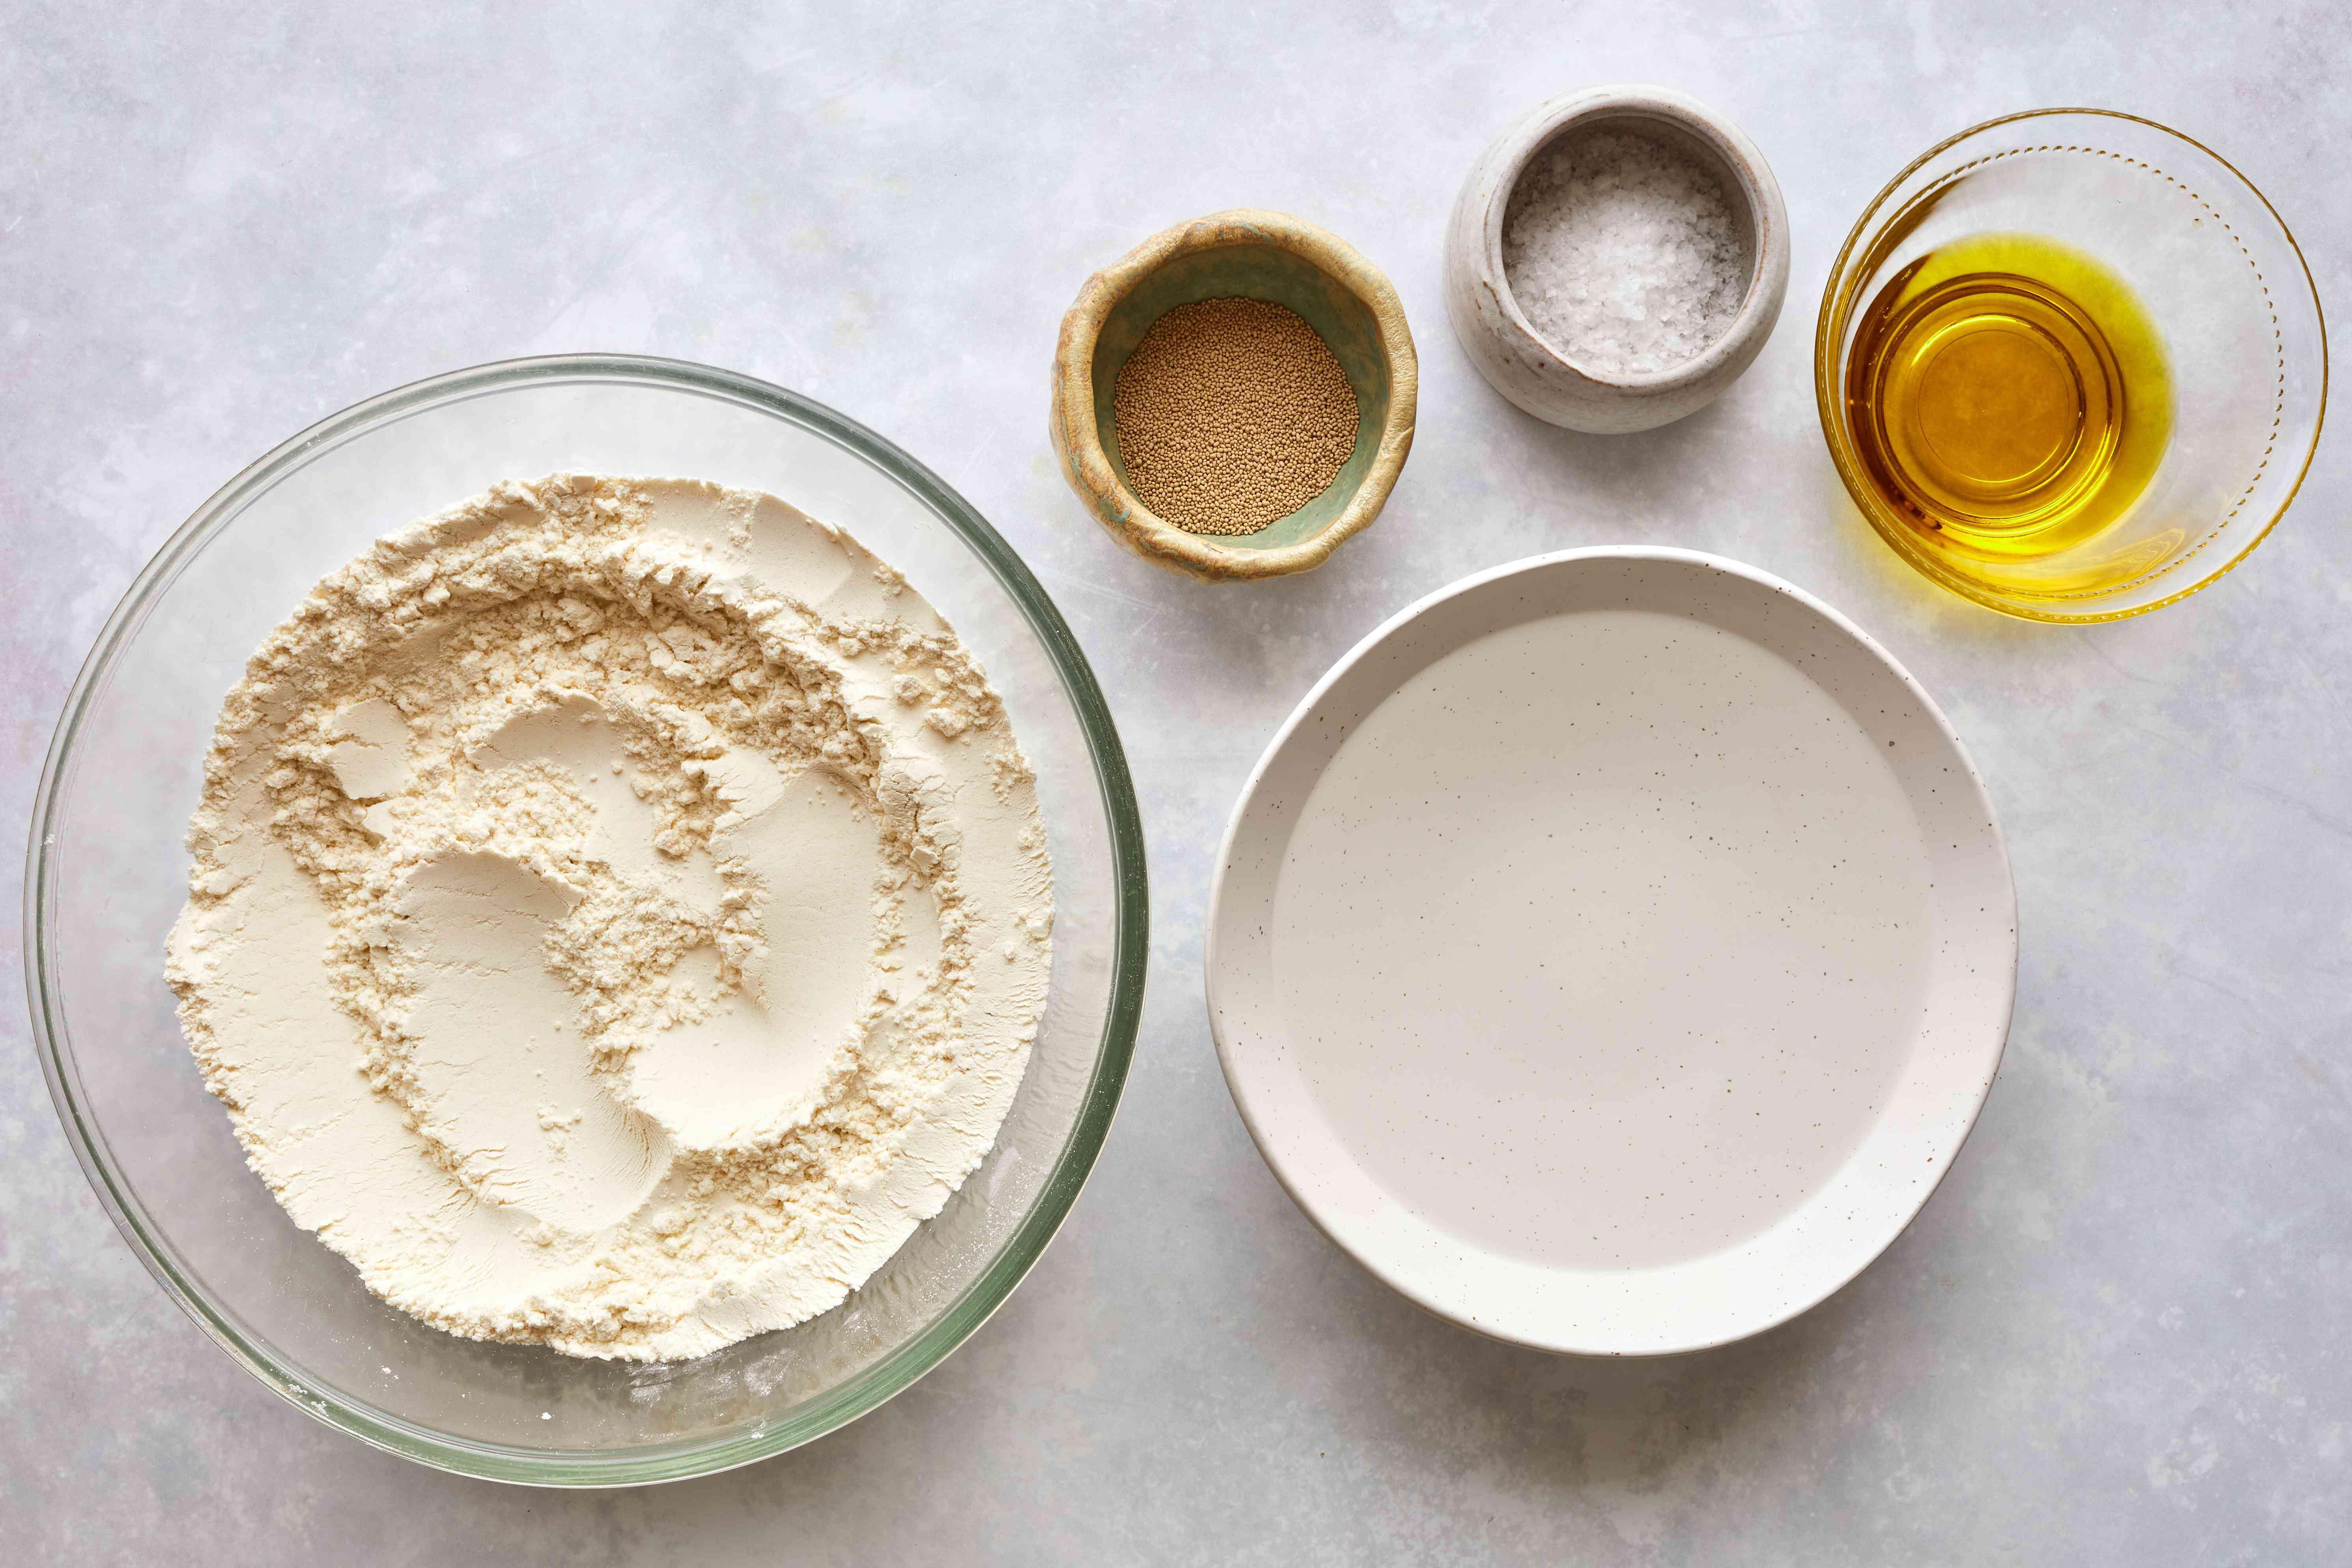 Homemade Pan Pizza Dough ingredients